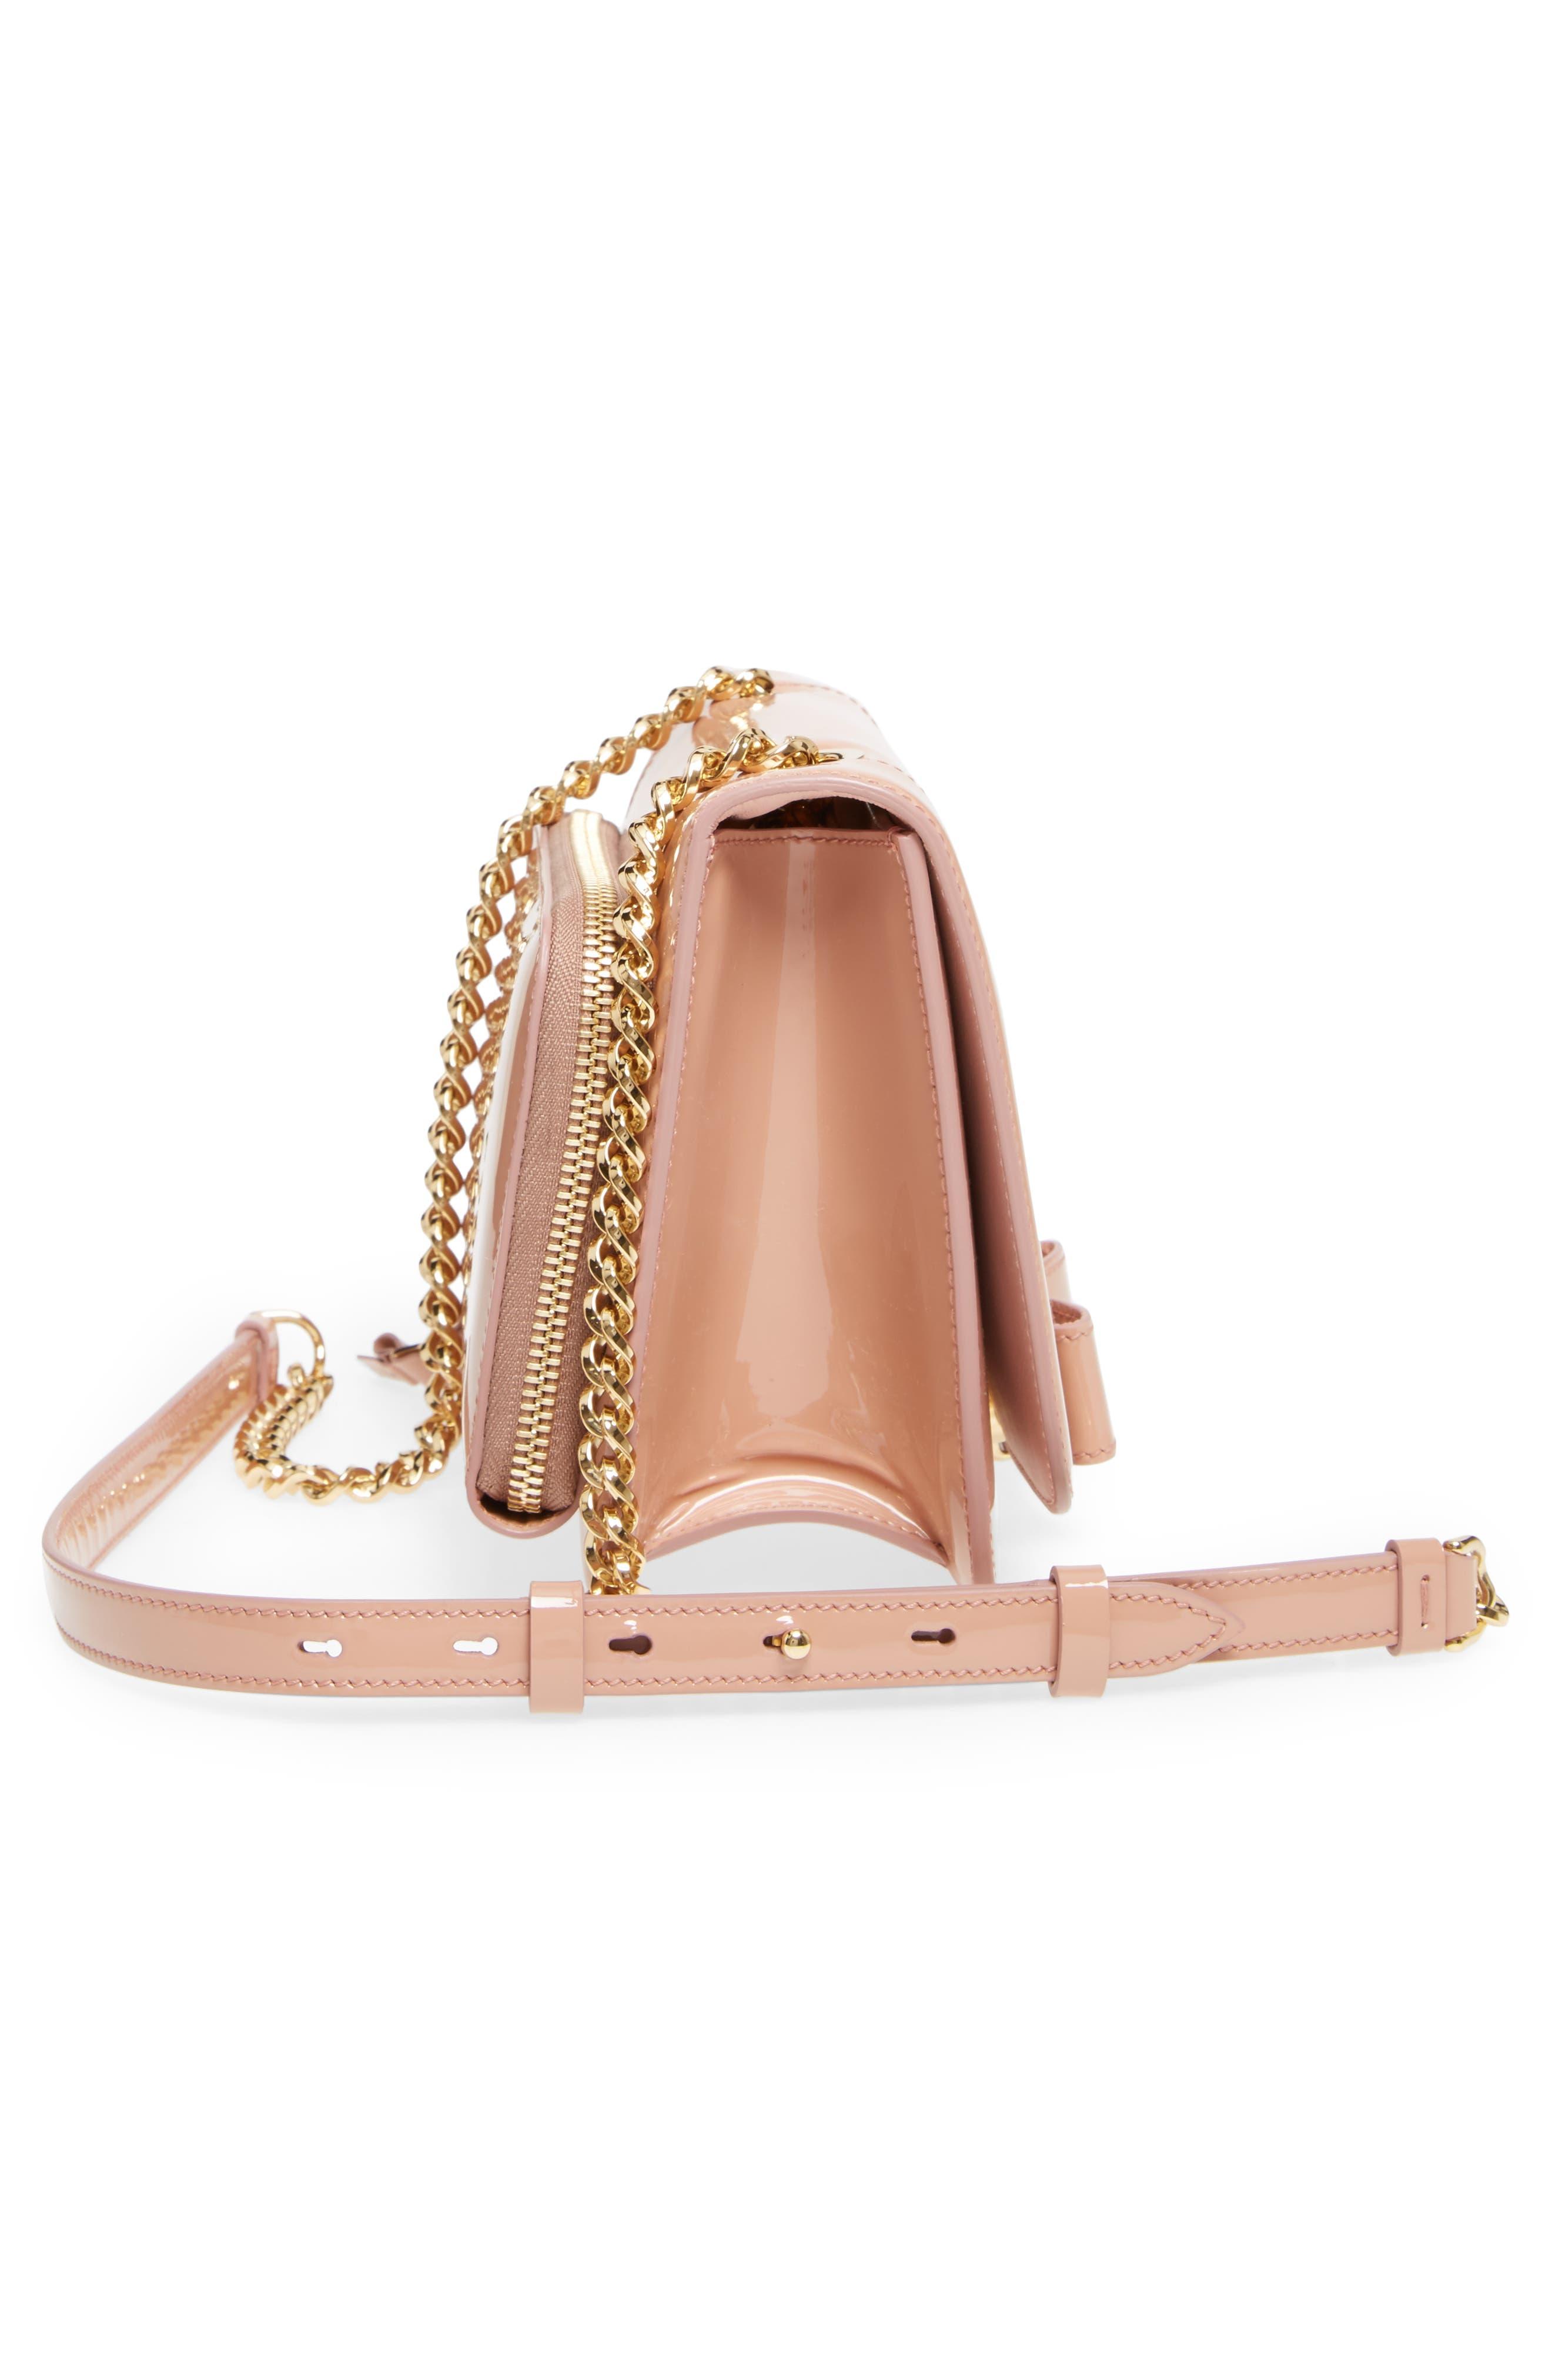 Vara Patent Leather Shoulder Bag,                             Alternate thumbnail 5, color,                             NEW BLUSH/ BONBON